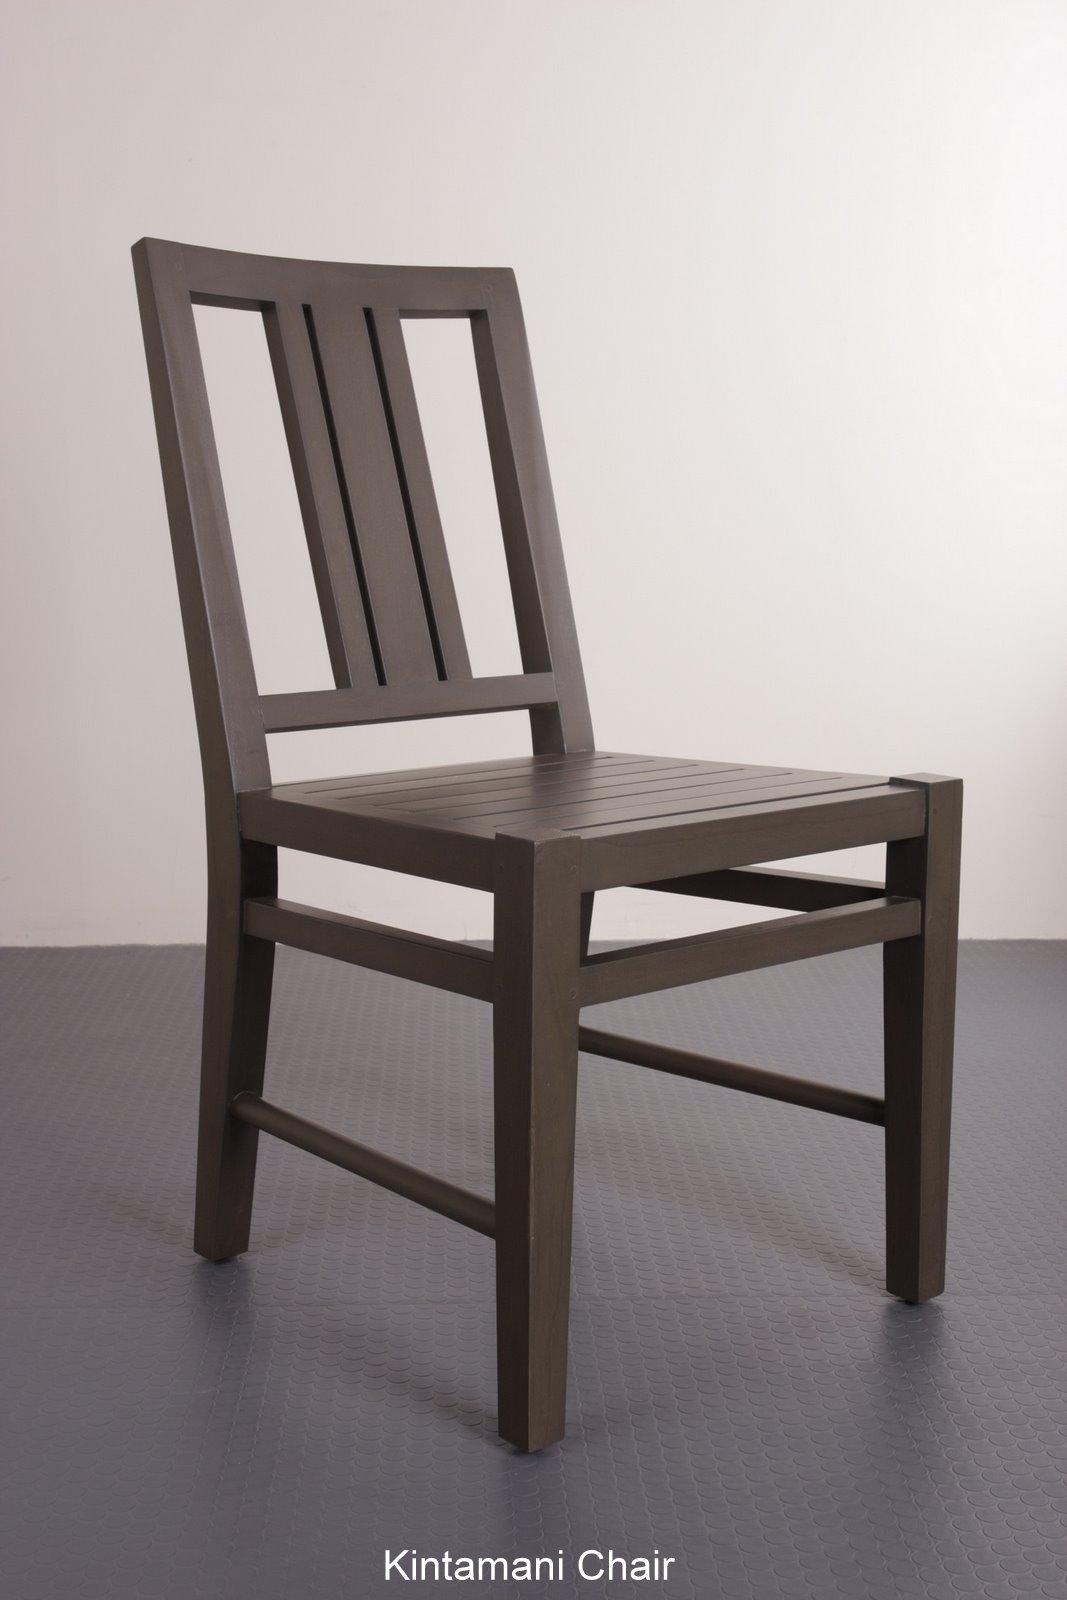 Kintamani Chair.jpg